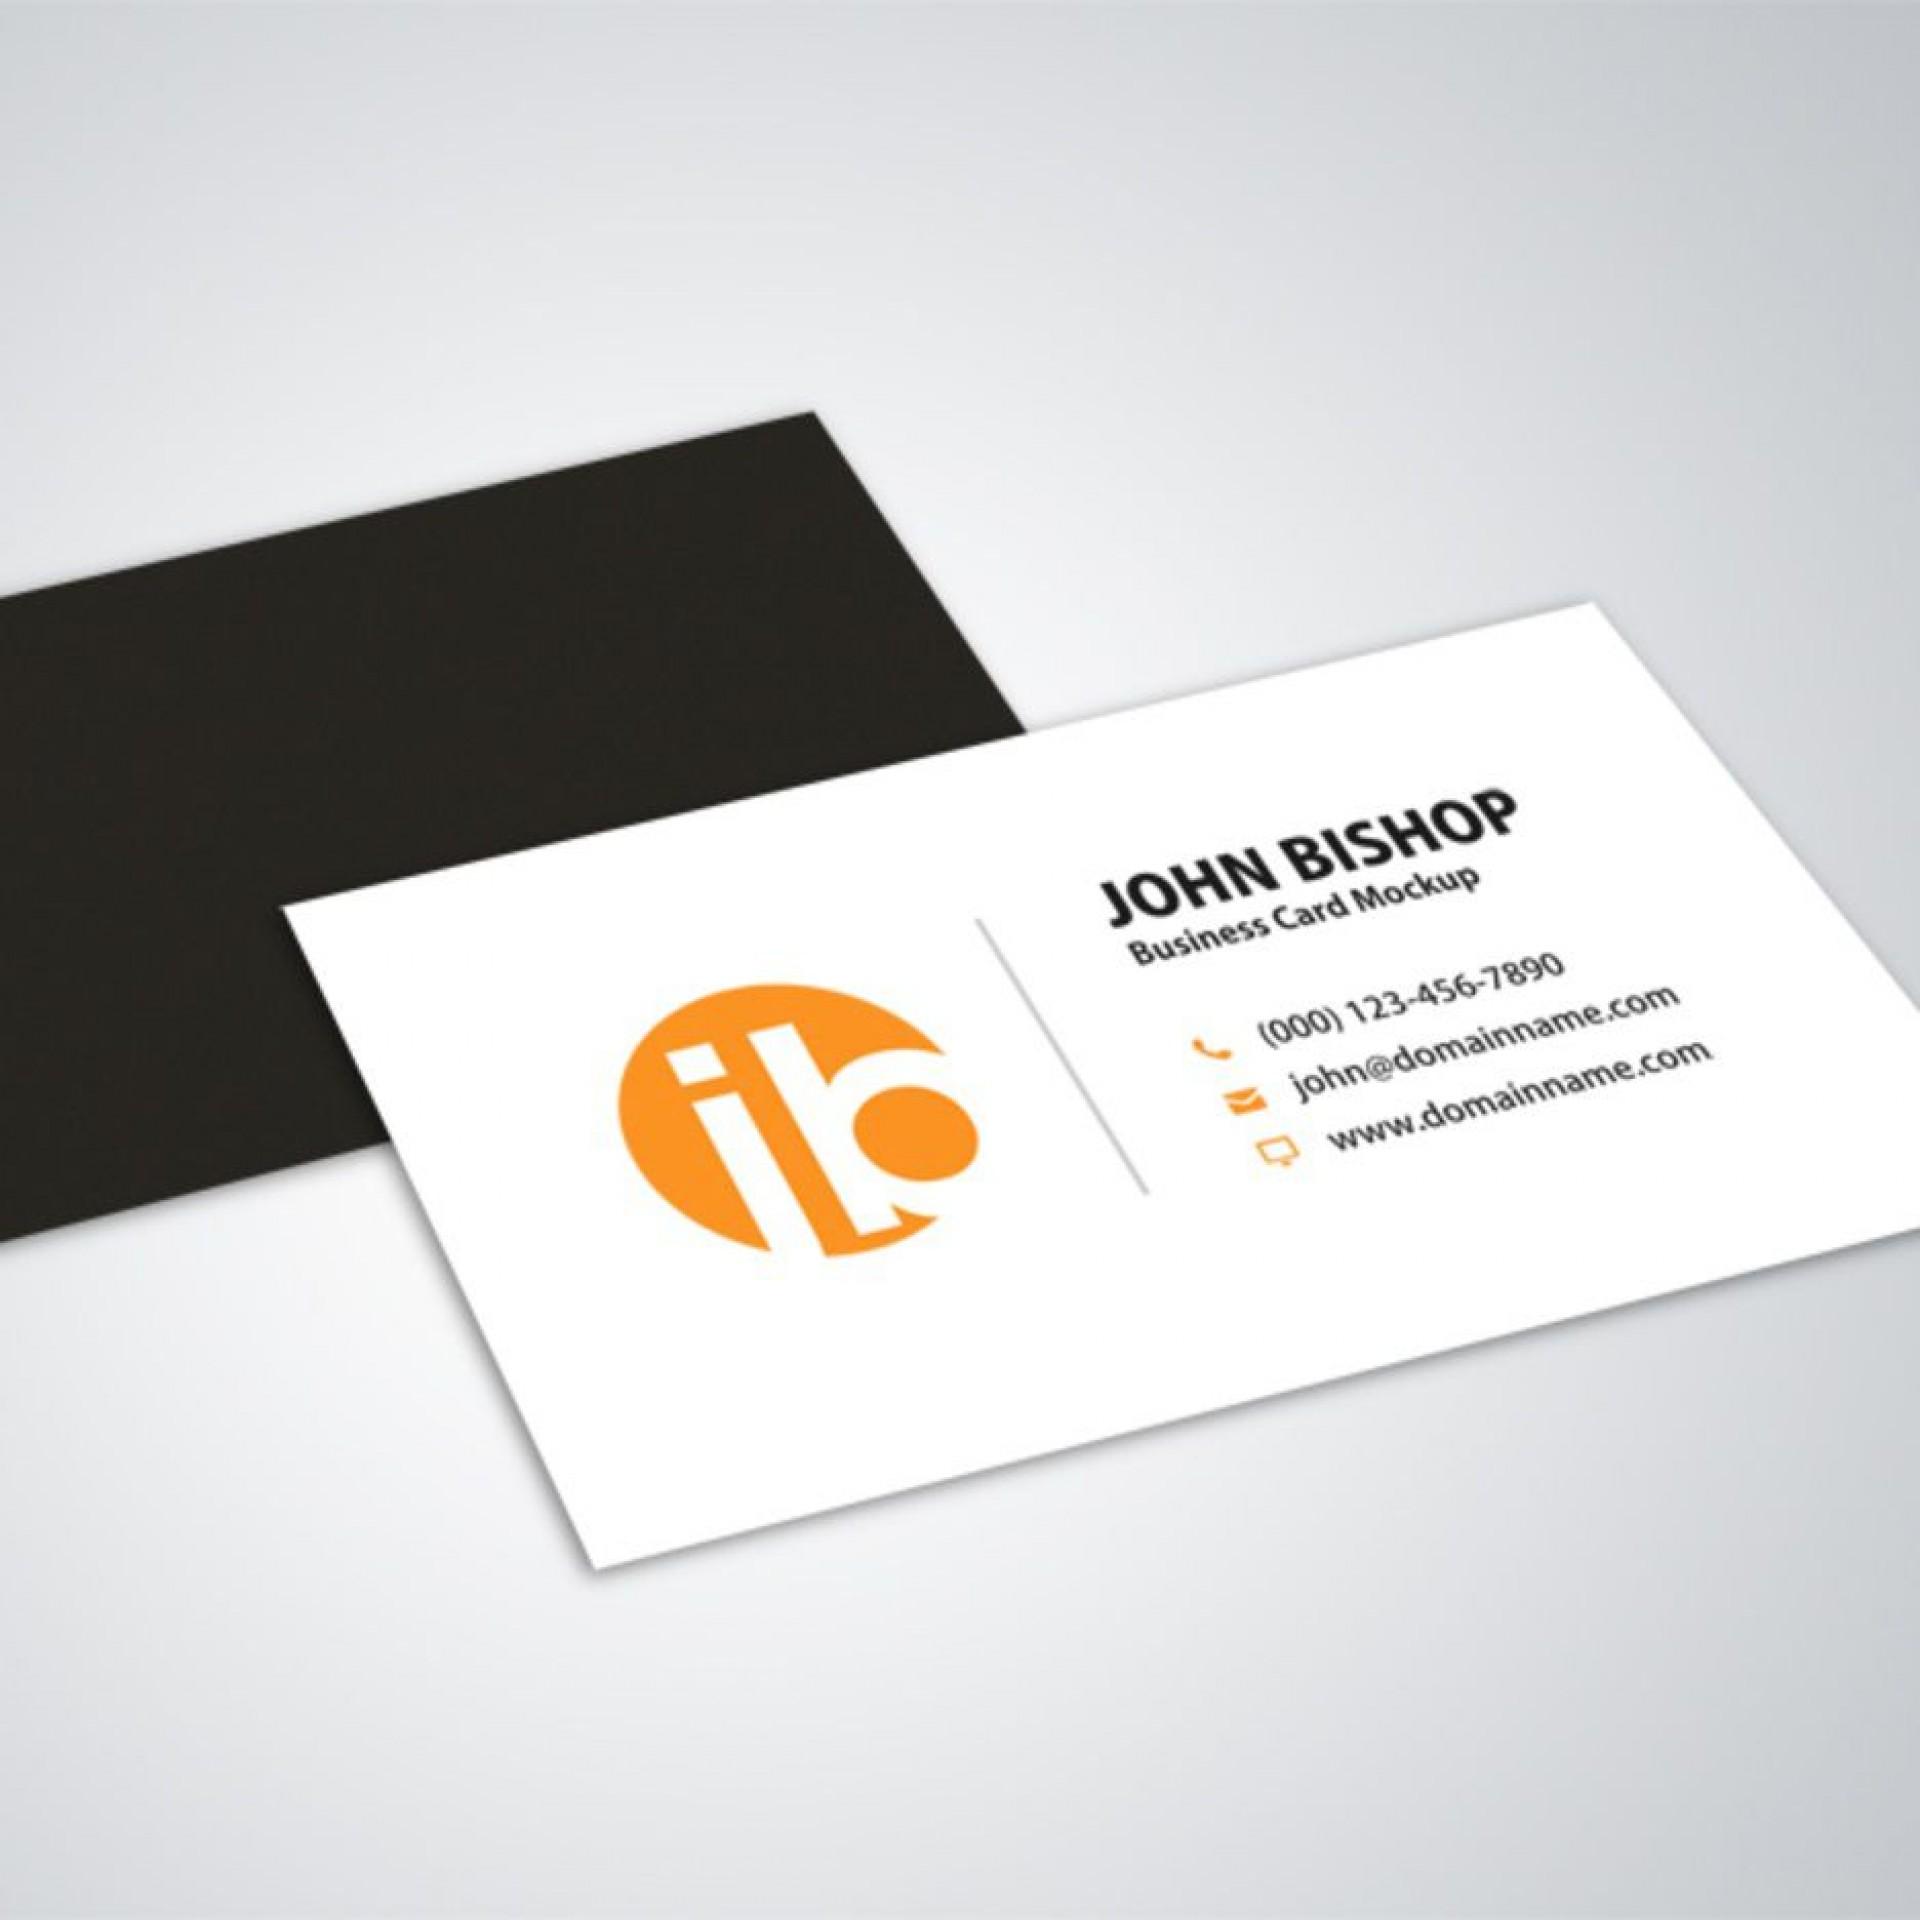 006 Wondrou Simple Visiting Card Design Picture  Busines Idea Psd File Free Download1920